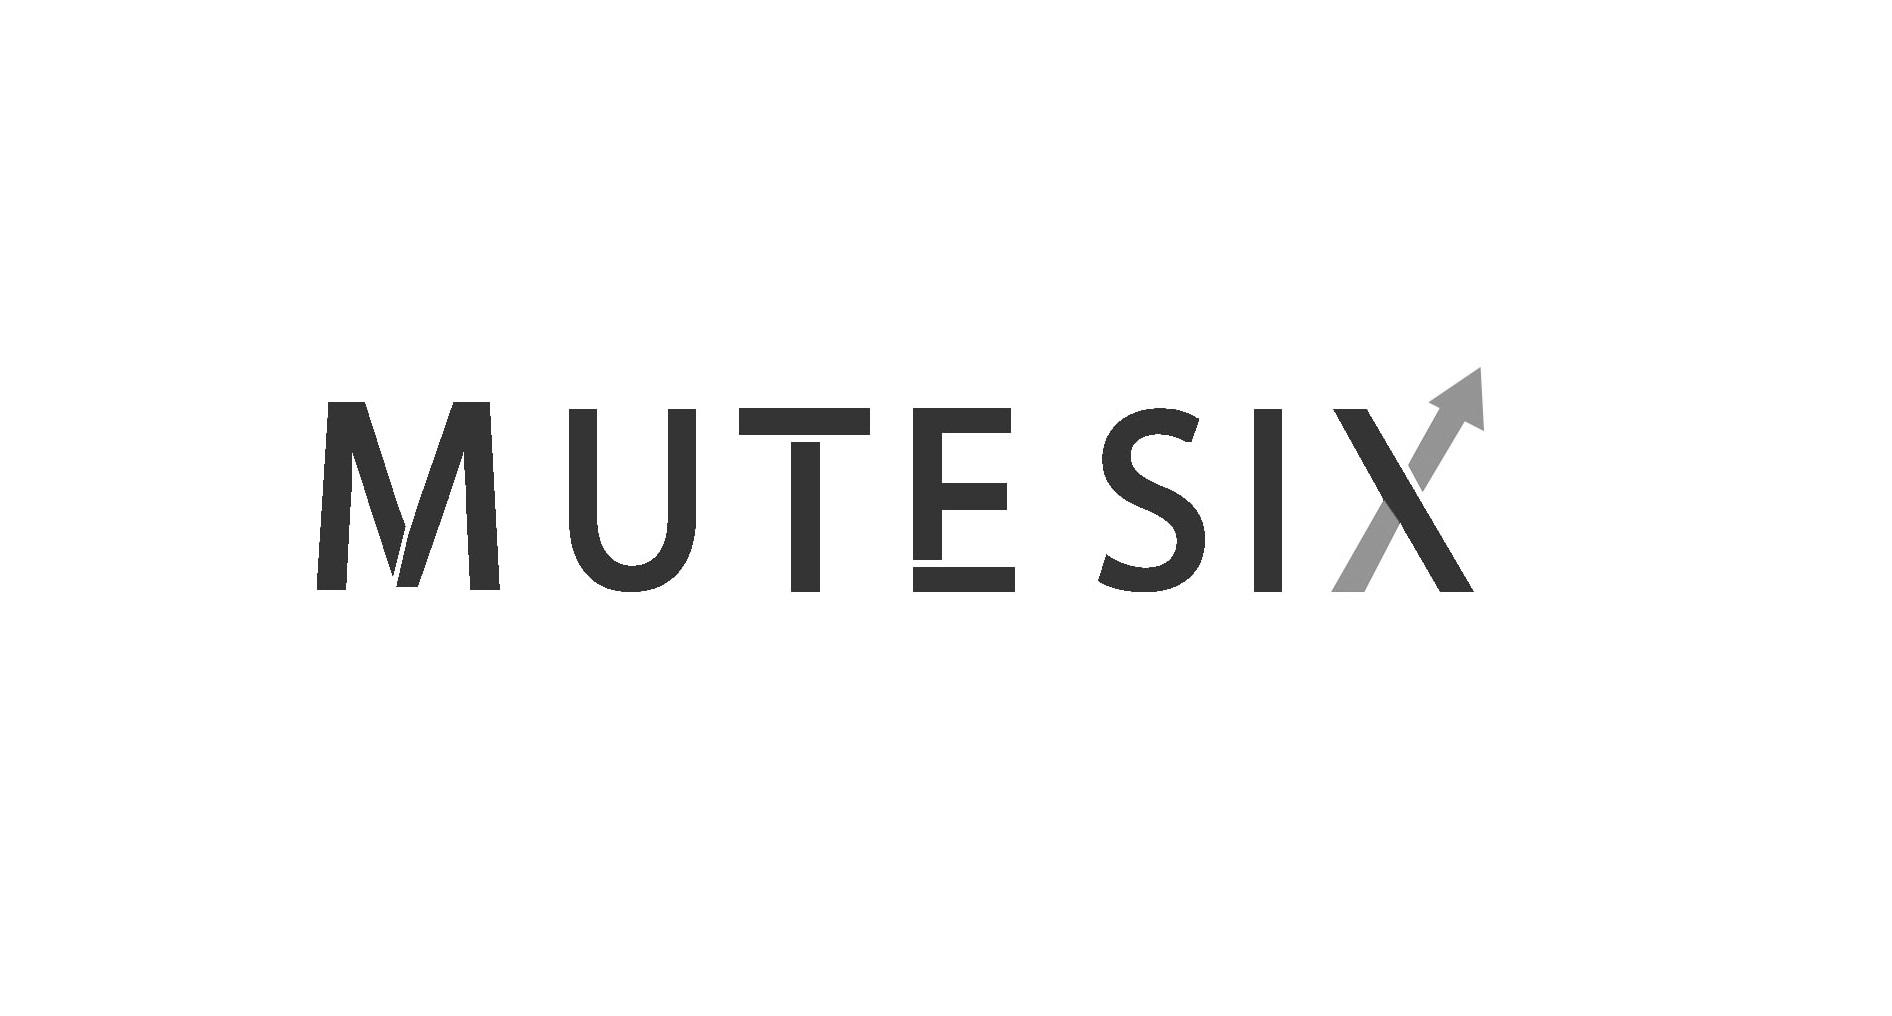 Mutesix.jpg